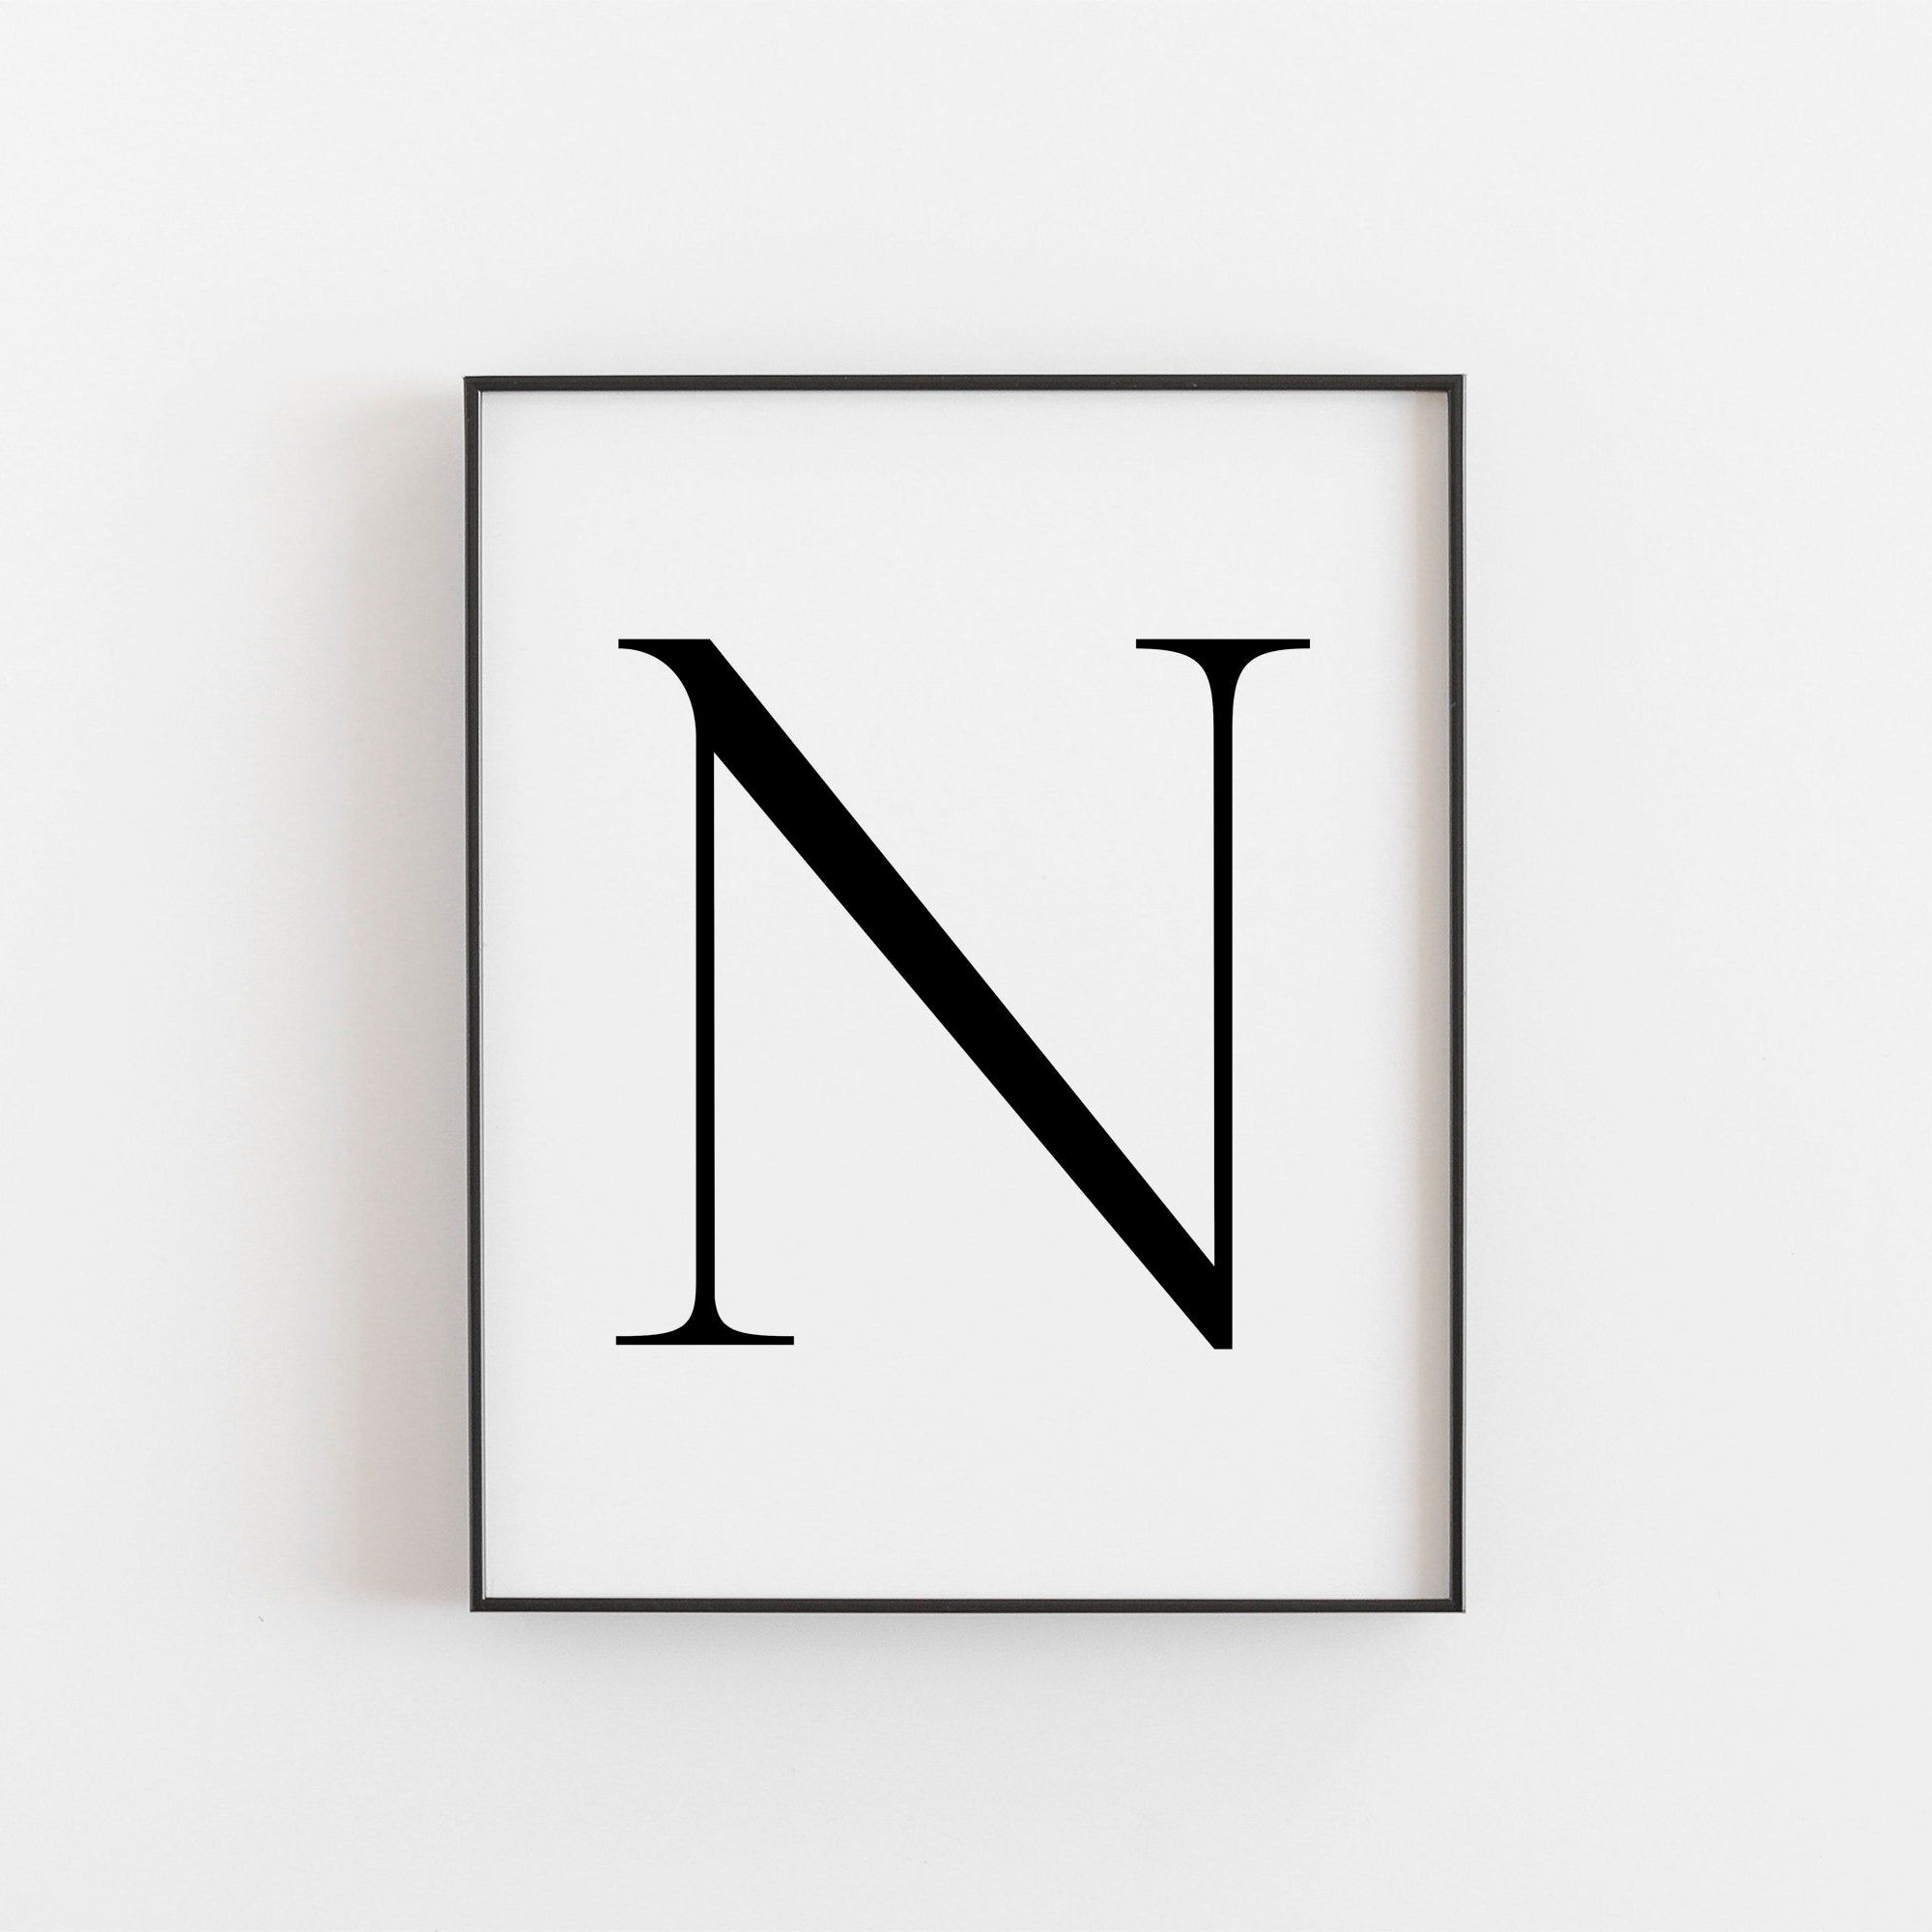 Letter N Wall Decor Letter N Print Letter N Poster Letter N Wall Art Letter N Sign Letter N Monogram Letter N Nursery Decor Initial N Scandinavian Print Nordic Print Minimalist